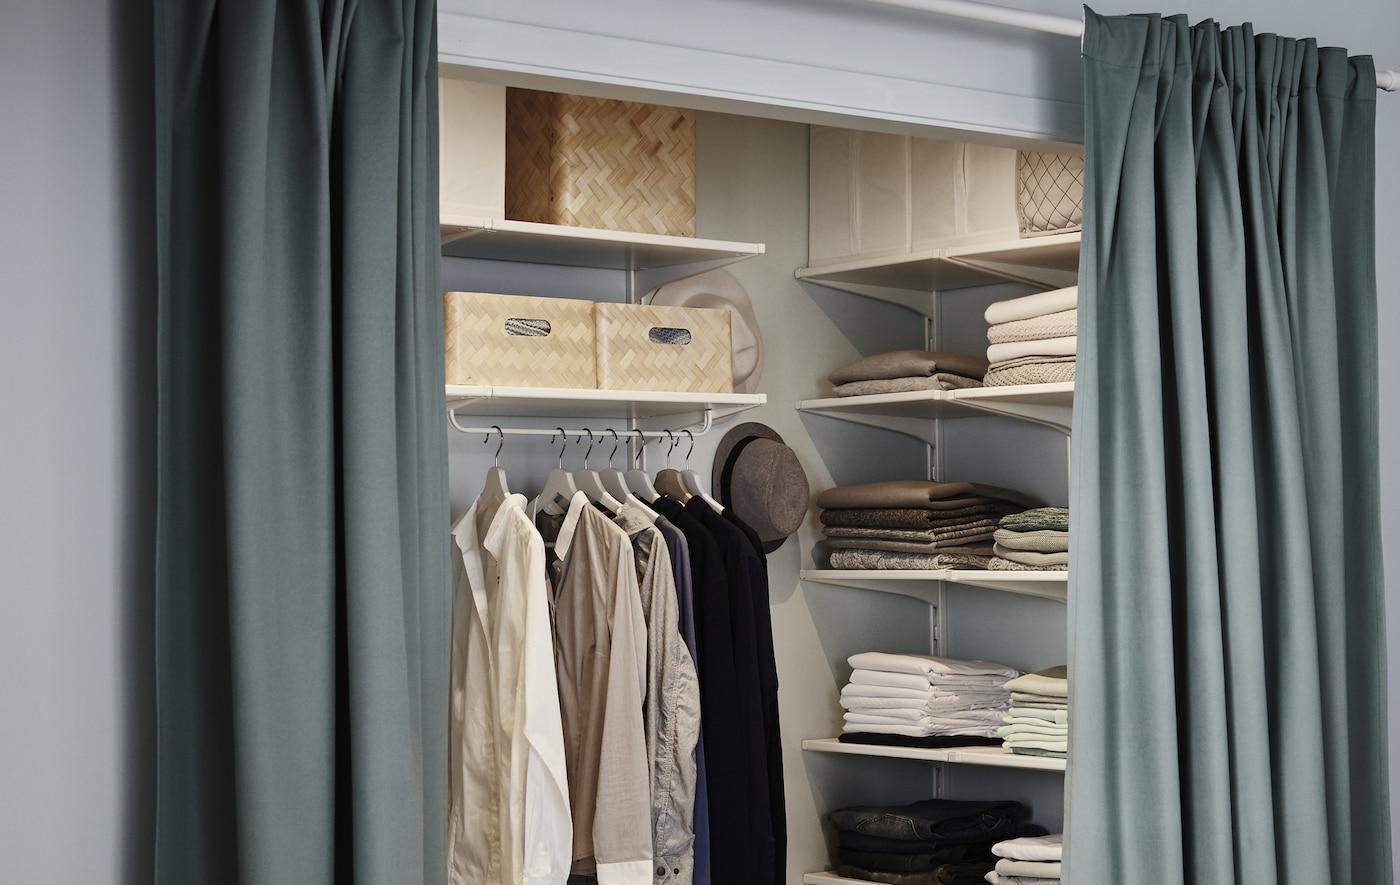 Begehbaren Kleiderschrank selberbauen   IKEA